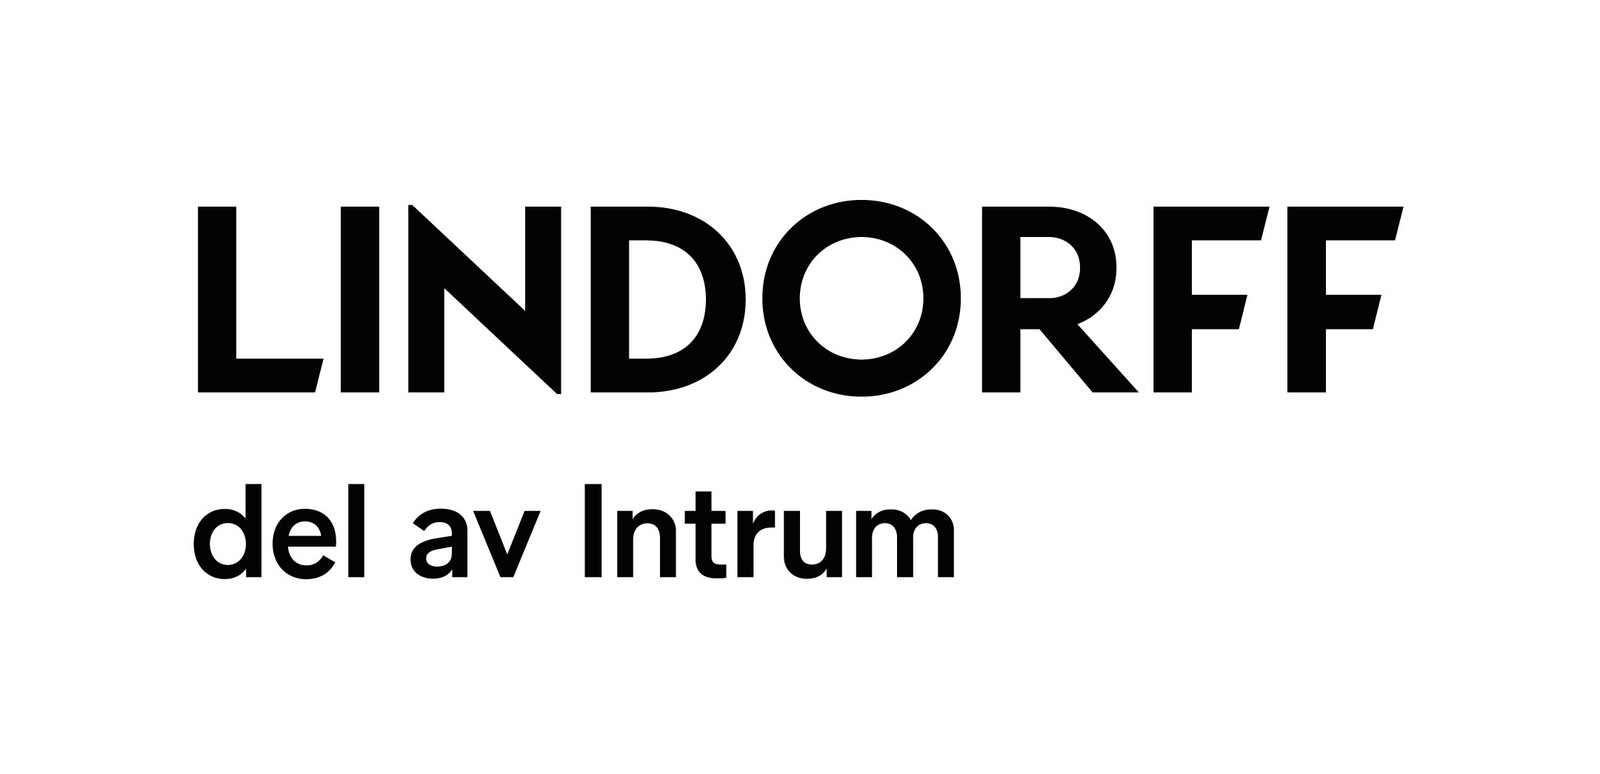 Lindorff AS